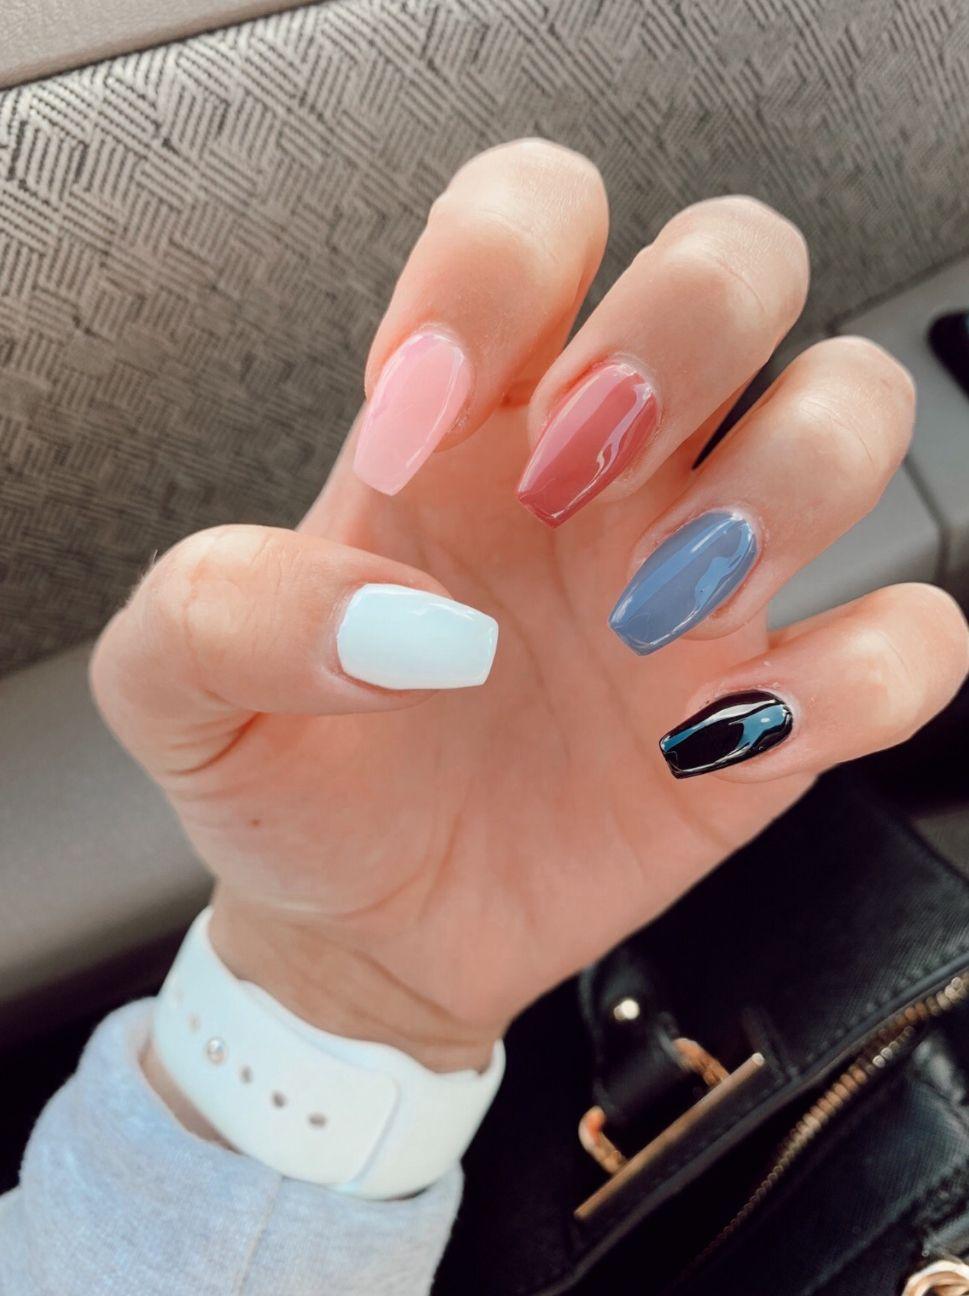 Pin By Phoenix Blue On Nail Inspo In 2020 Short Acrylic Nails Dream Nails Cute Acrylic Nails